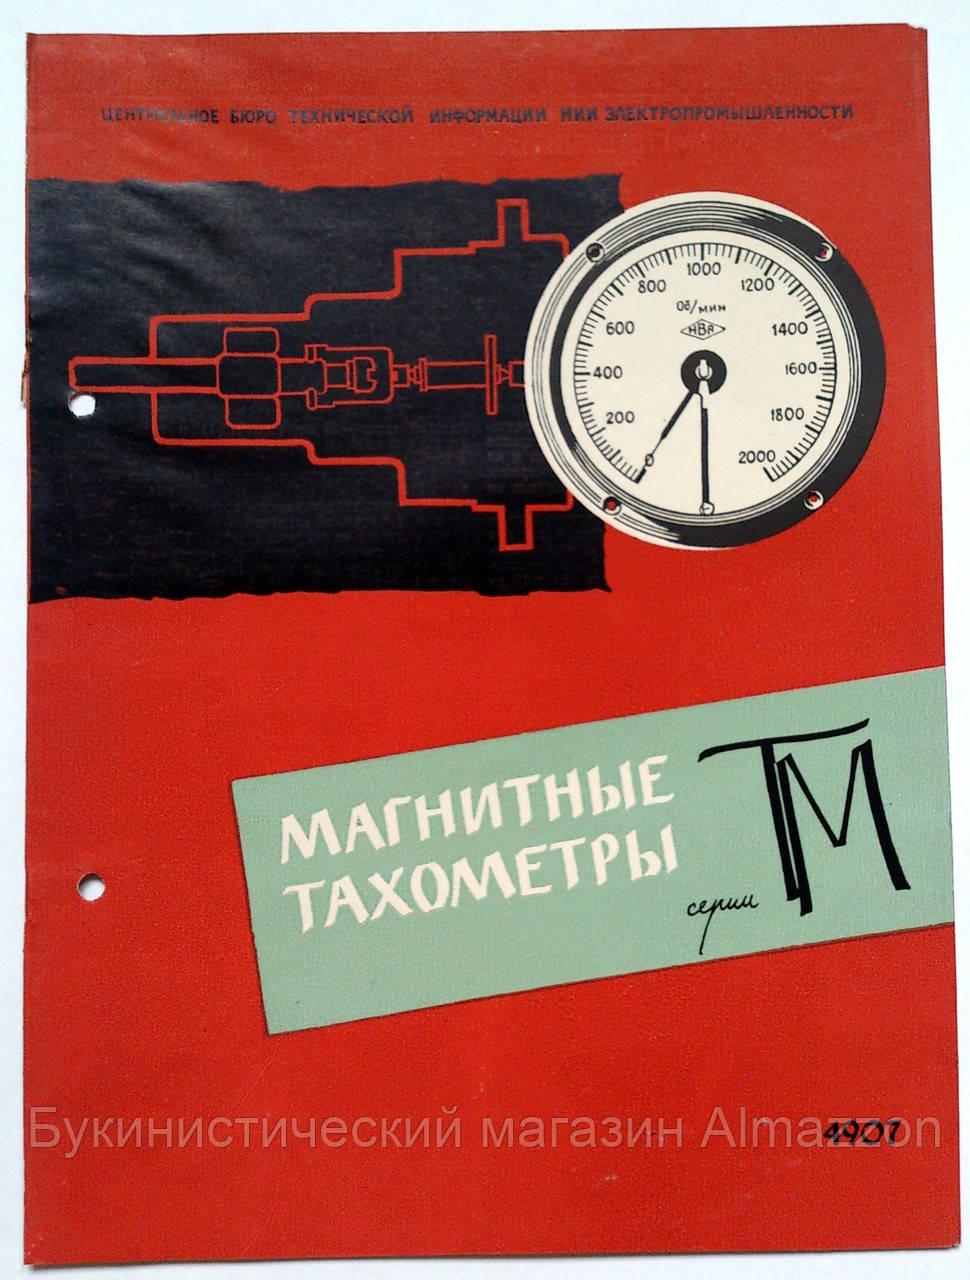 "Журнал (Бюллетень)  ""Магнитные тахометры серии ТМ"" 1959 год"